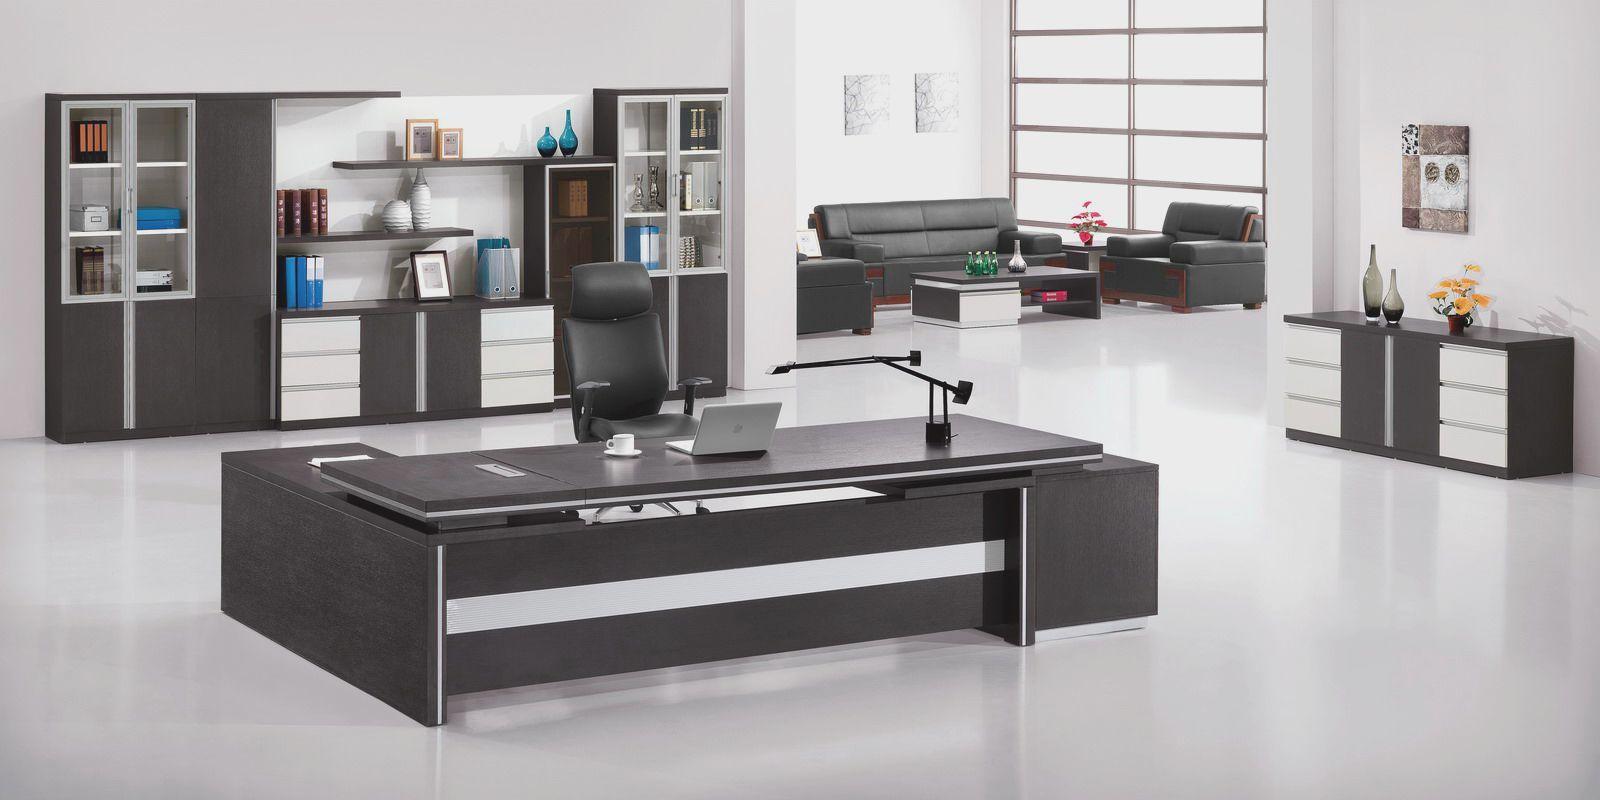 liebenswert büro möbel design ideen #büromöbel | büromöbel